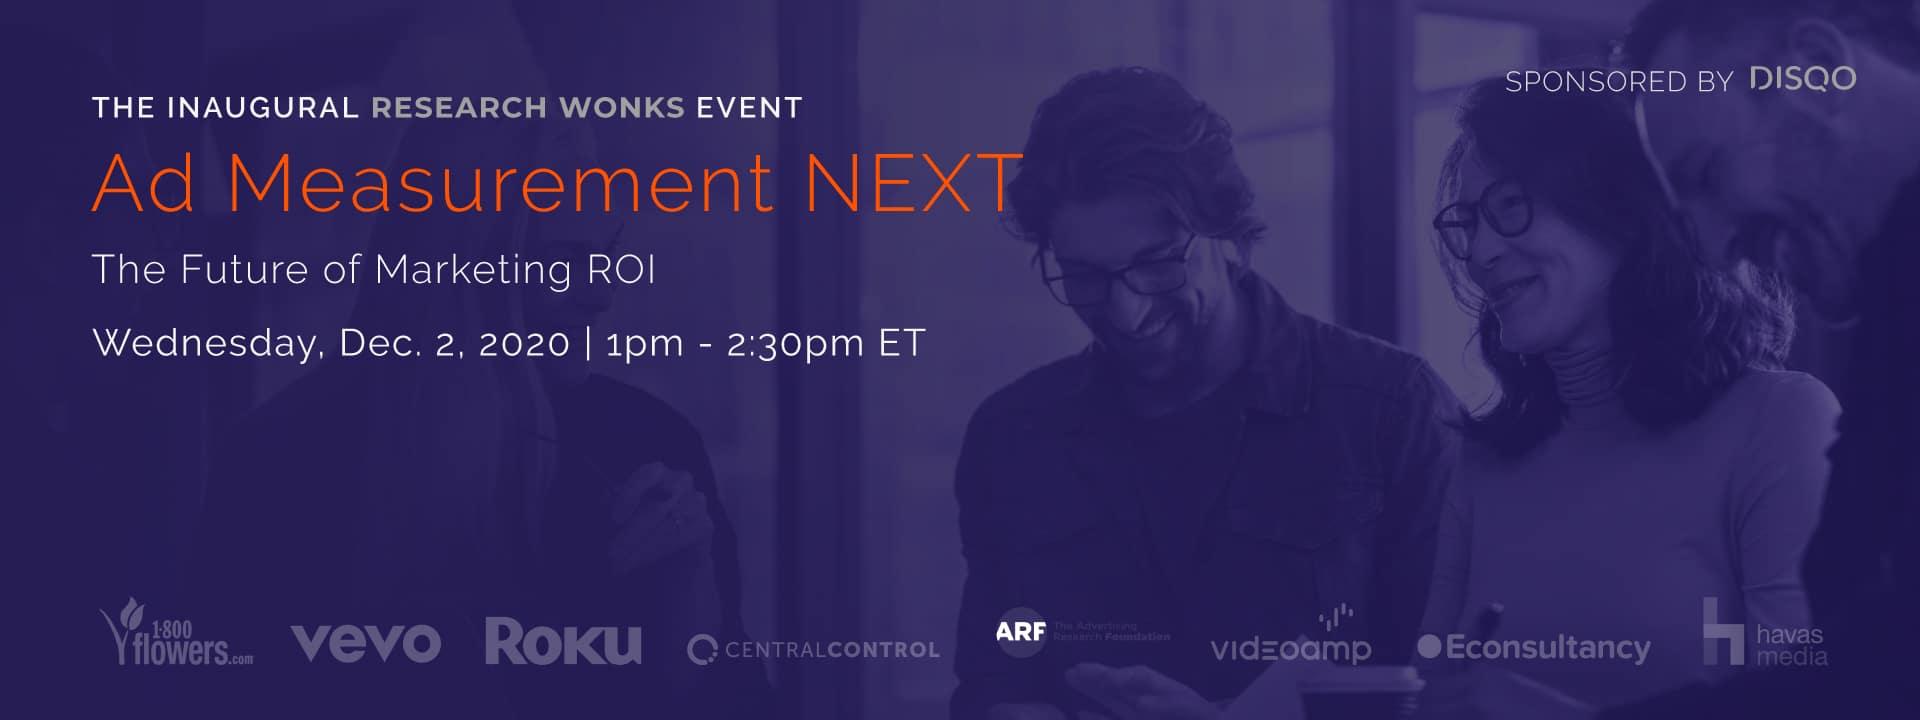 Ad Measurement NEXT: The Future of Marketing ROI